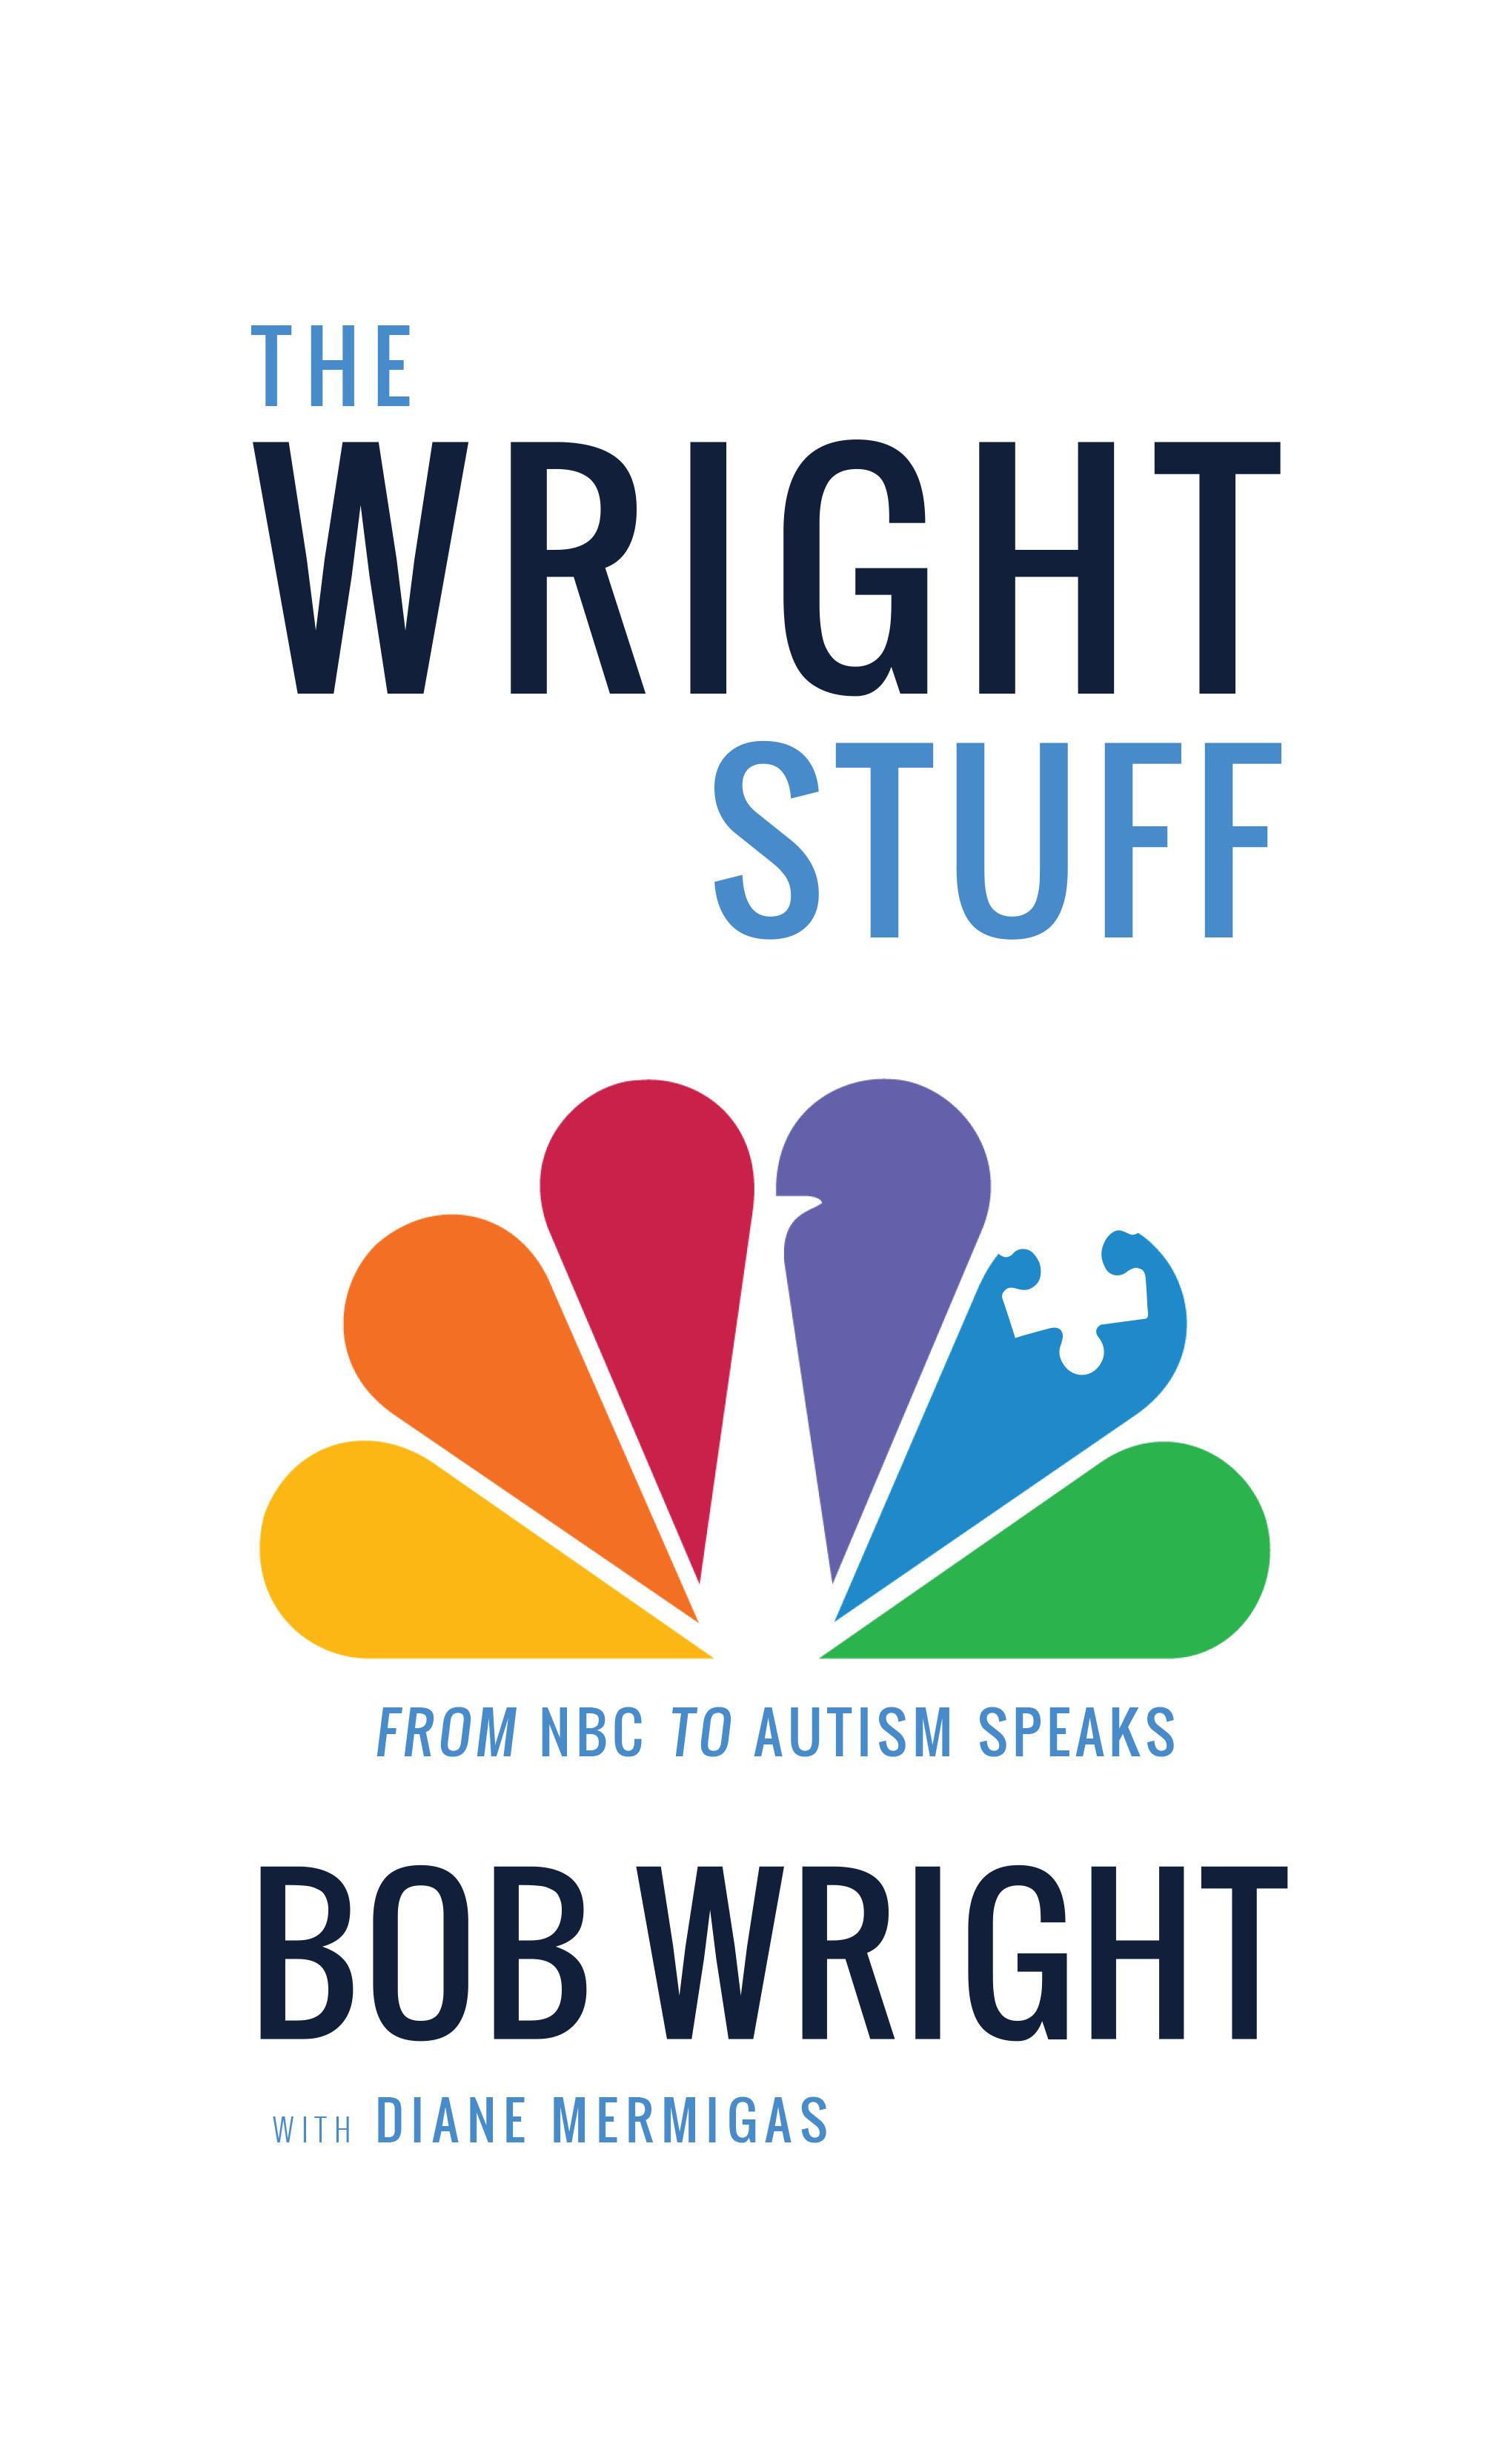 WrightStuff_DJ_final peter update 20160125.indd